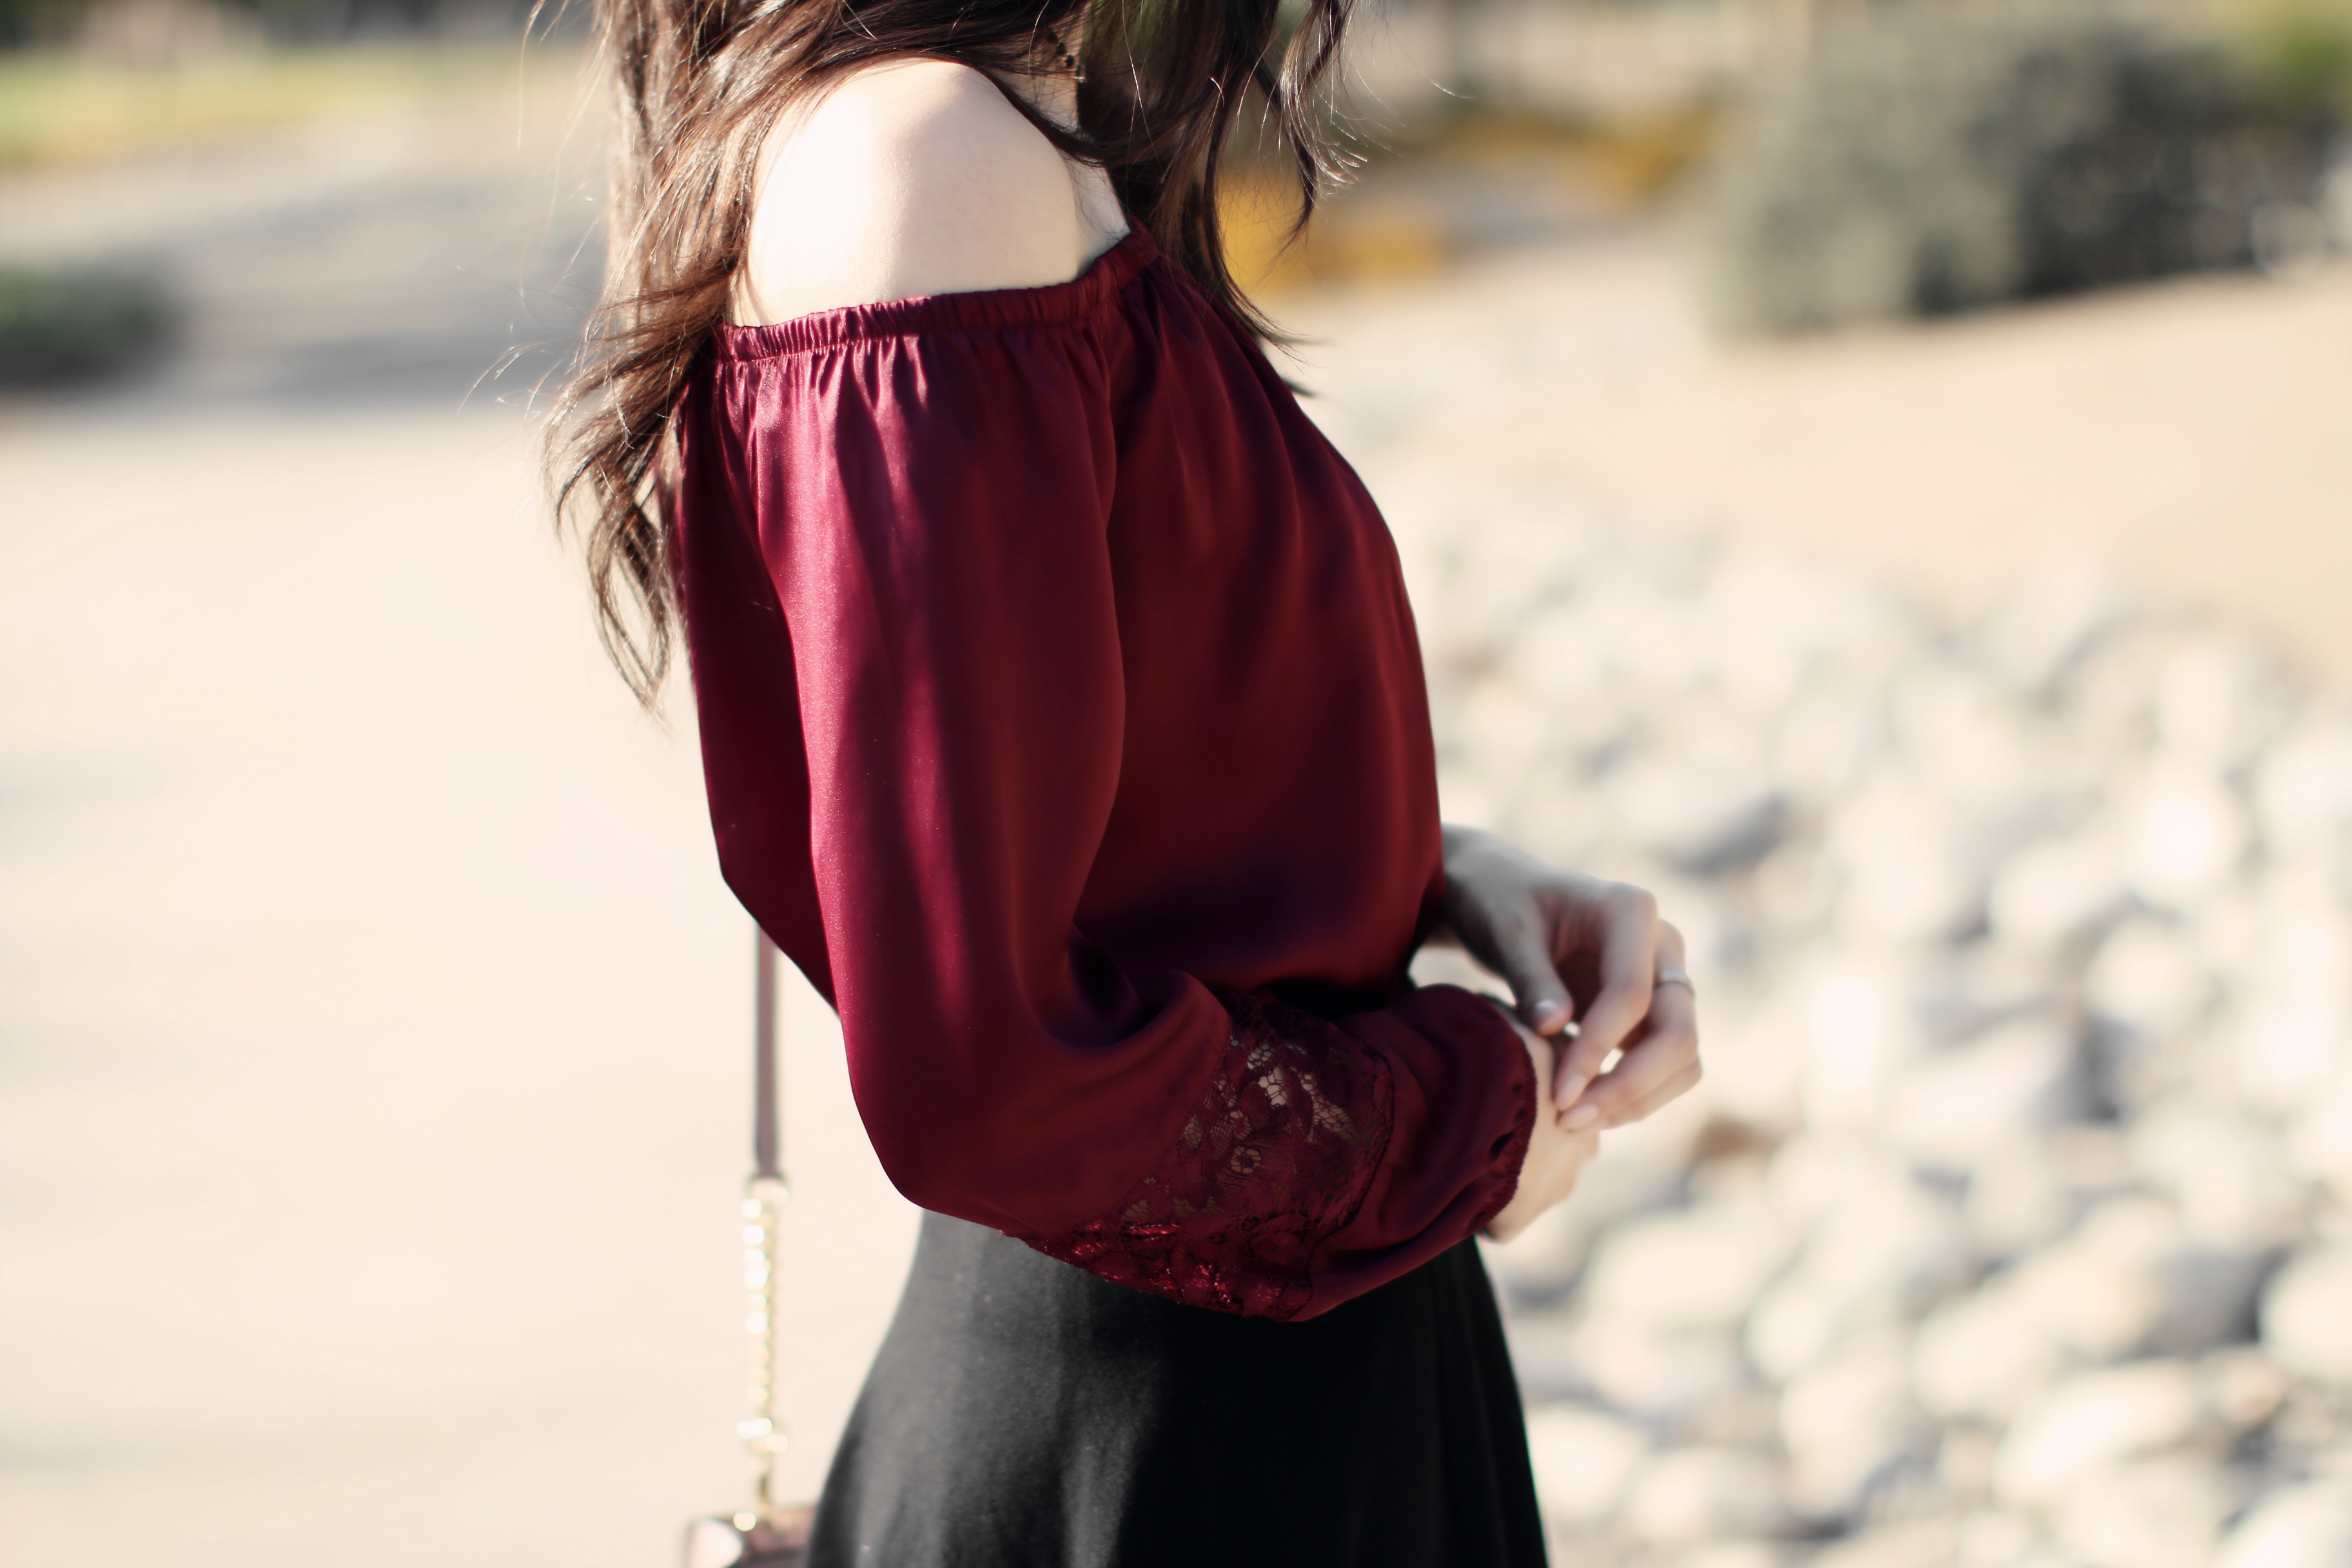 3601-ootd-fashion-style-outfitoftheday-wiwt-silk-lace-fallfashion-forever21-f21xme-elizabeeetht-clothestoyouuu